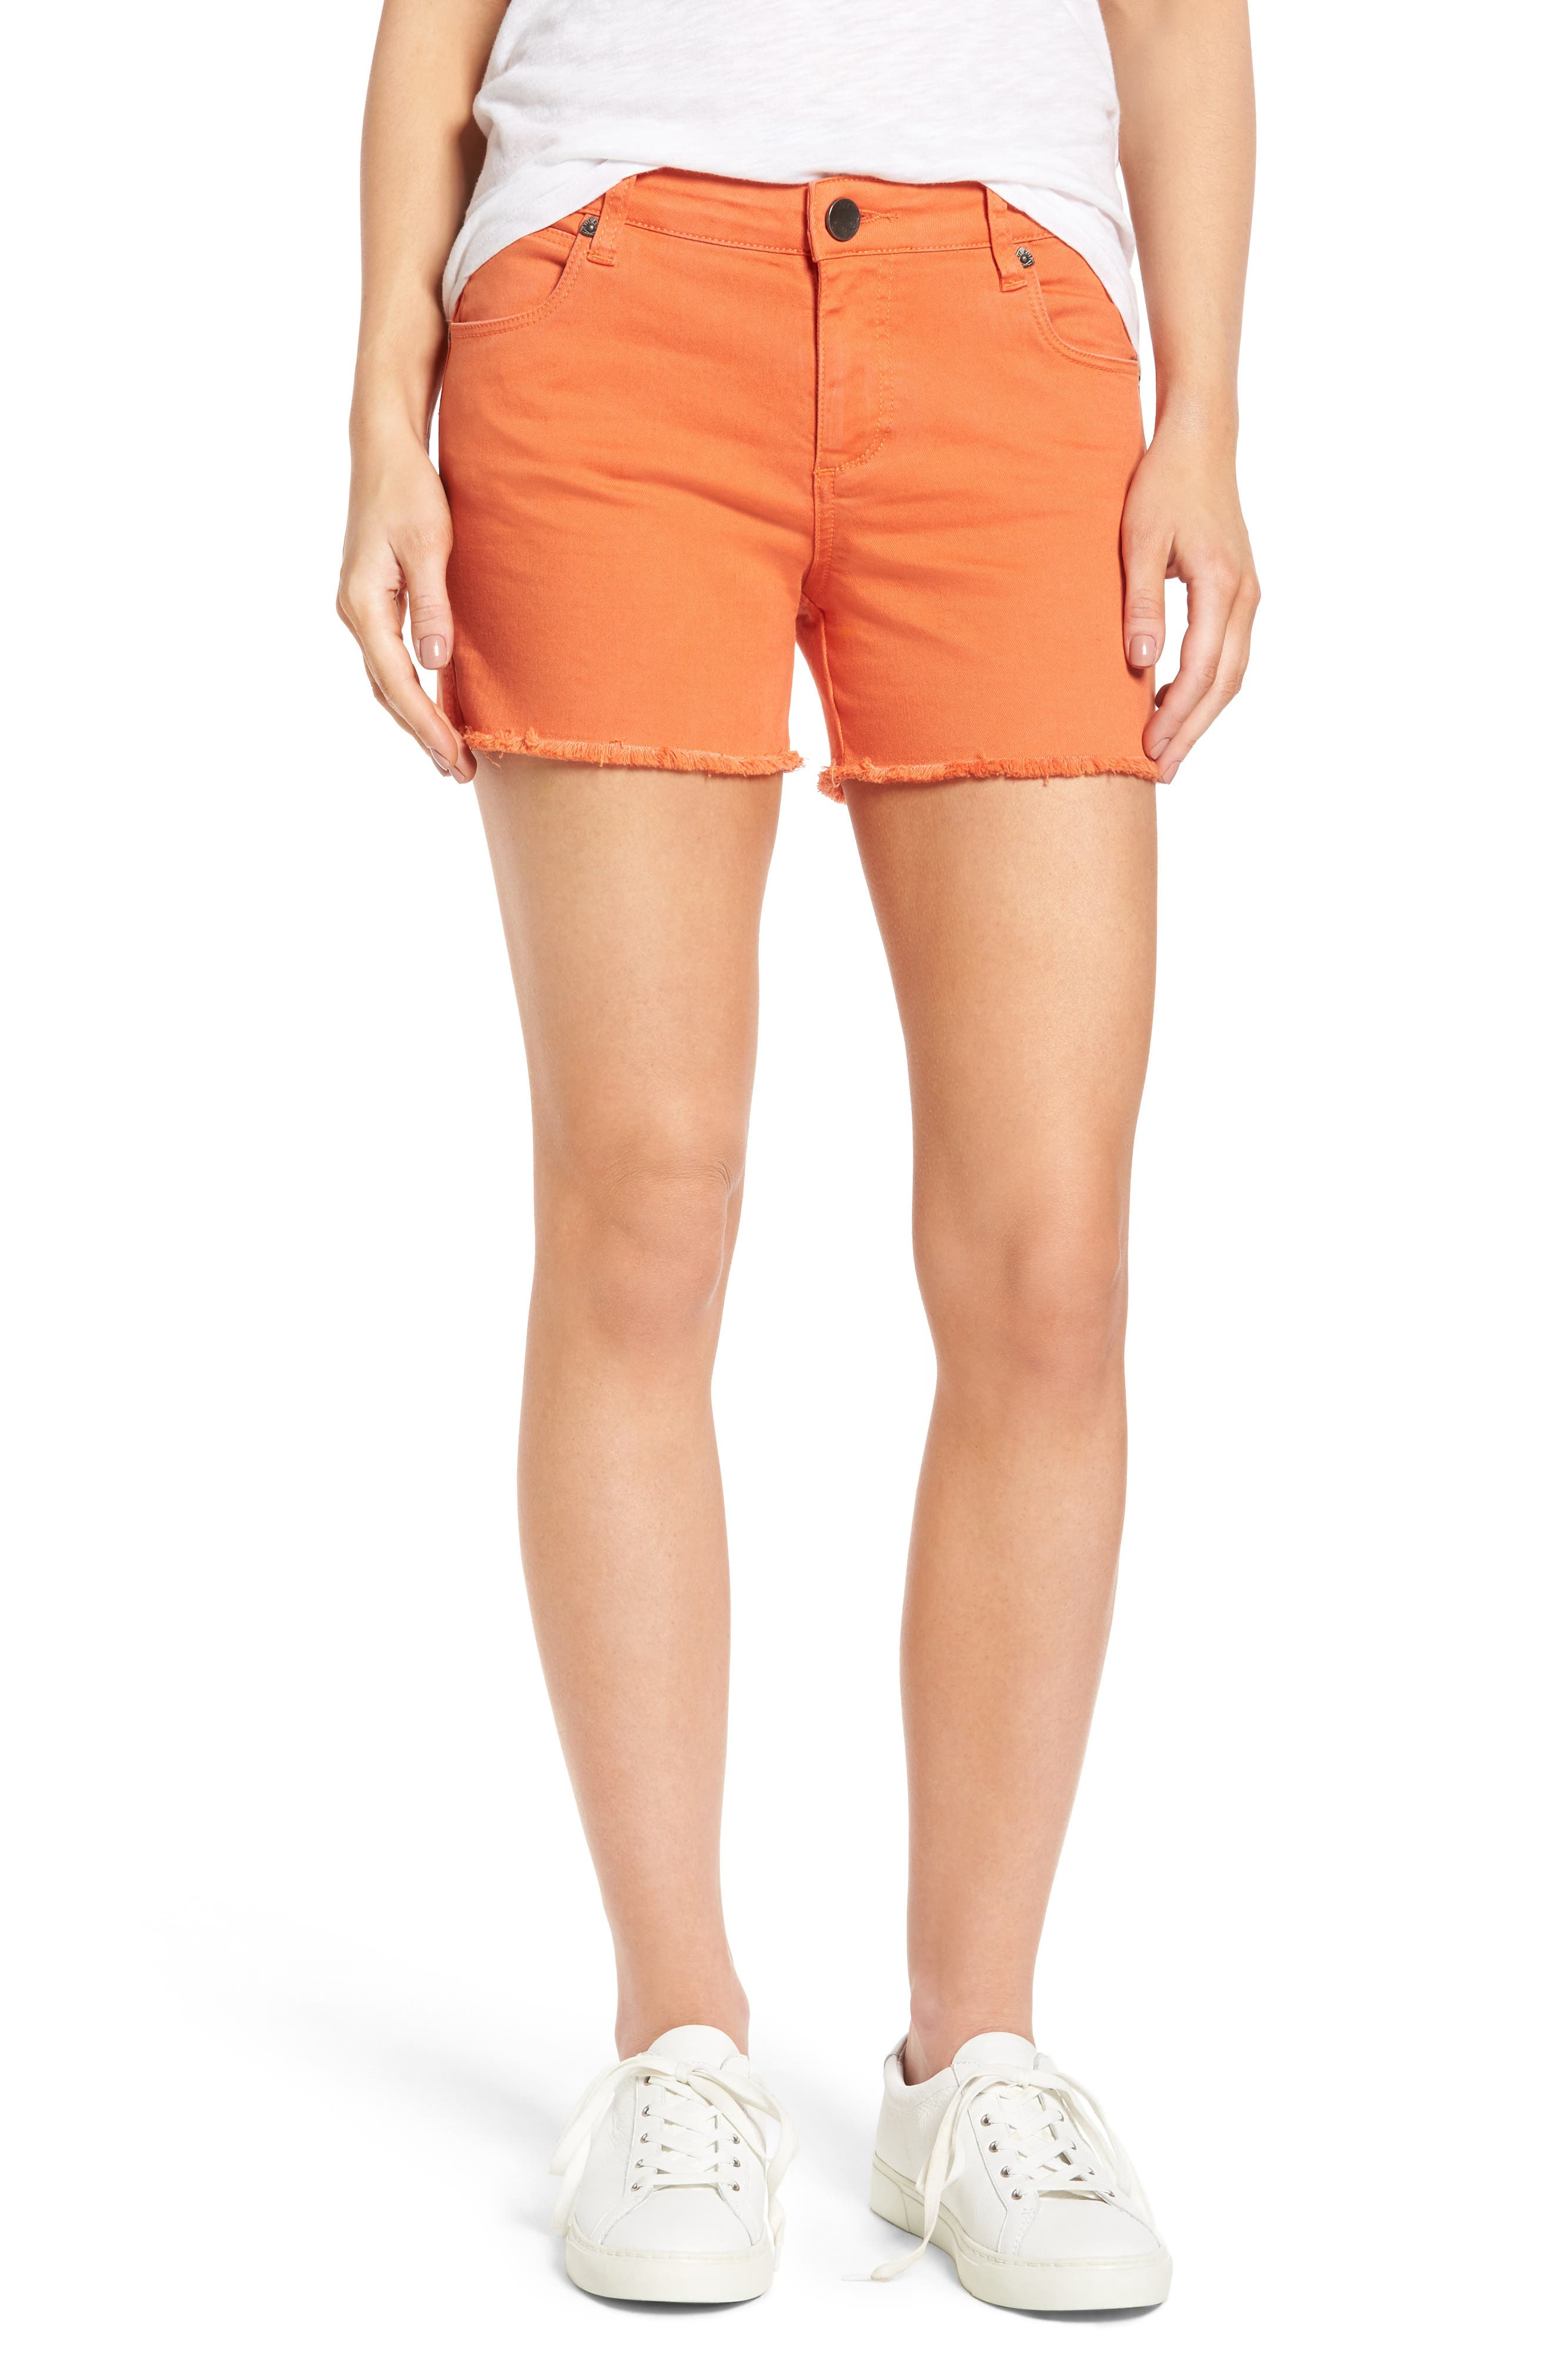 KUT from the Kloth Gidget Fray Hem Orange Denim Shorts